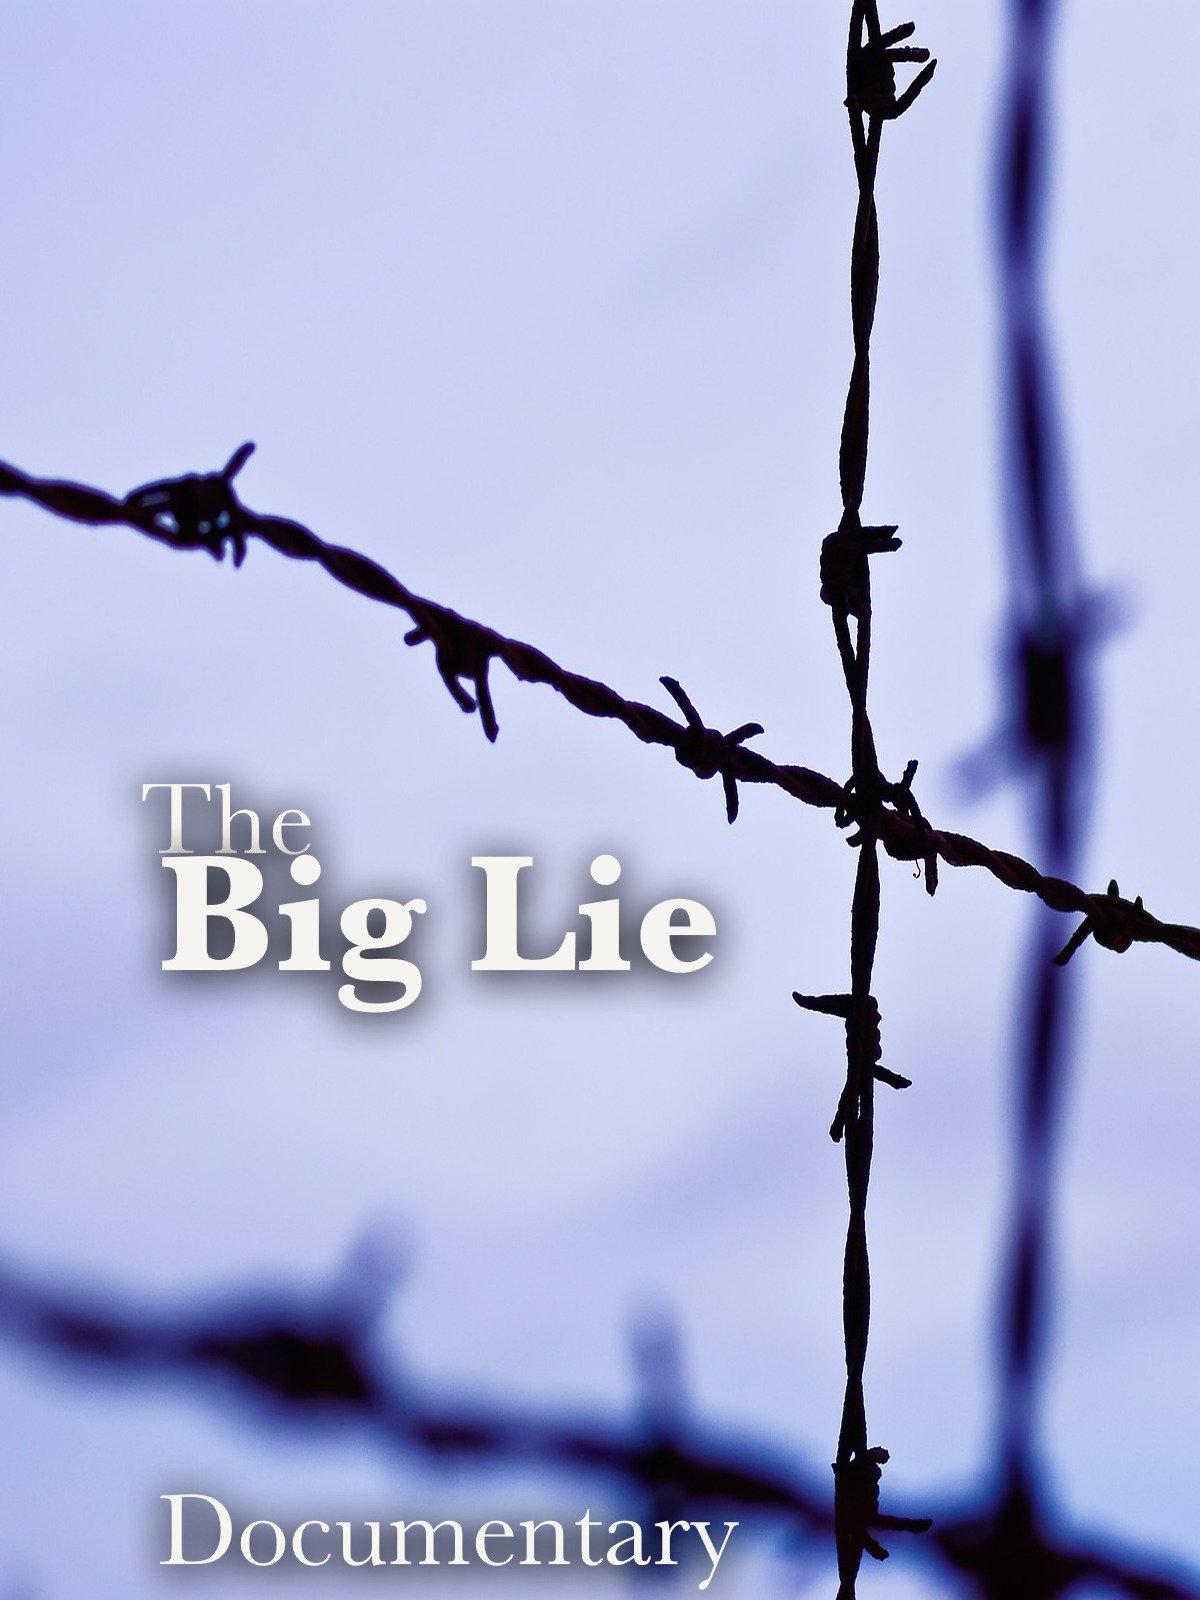 The Big Lie Documentary